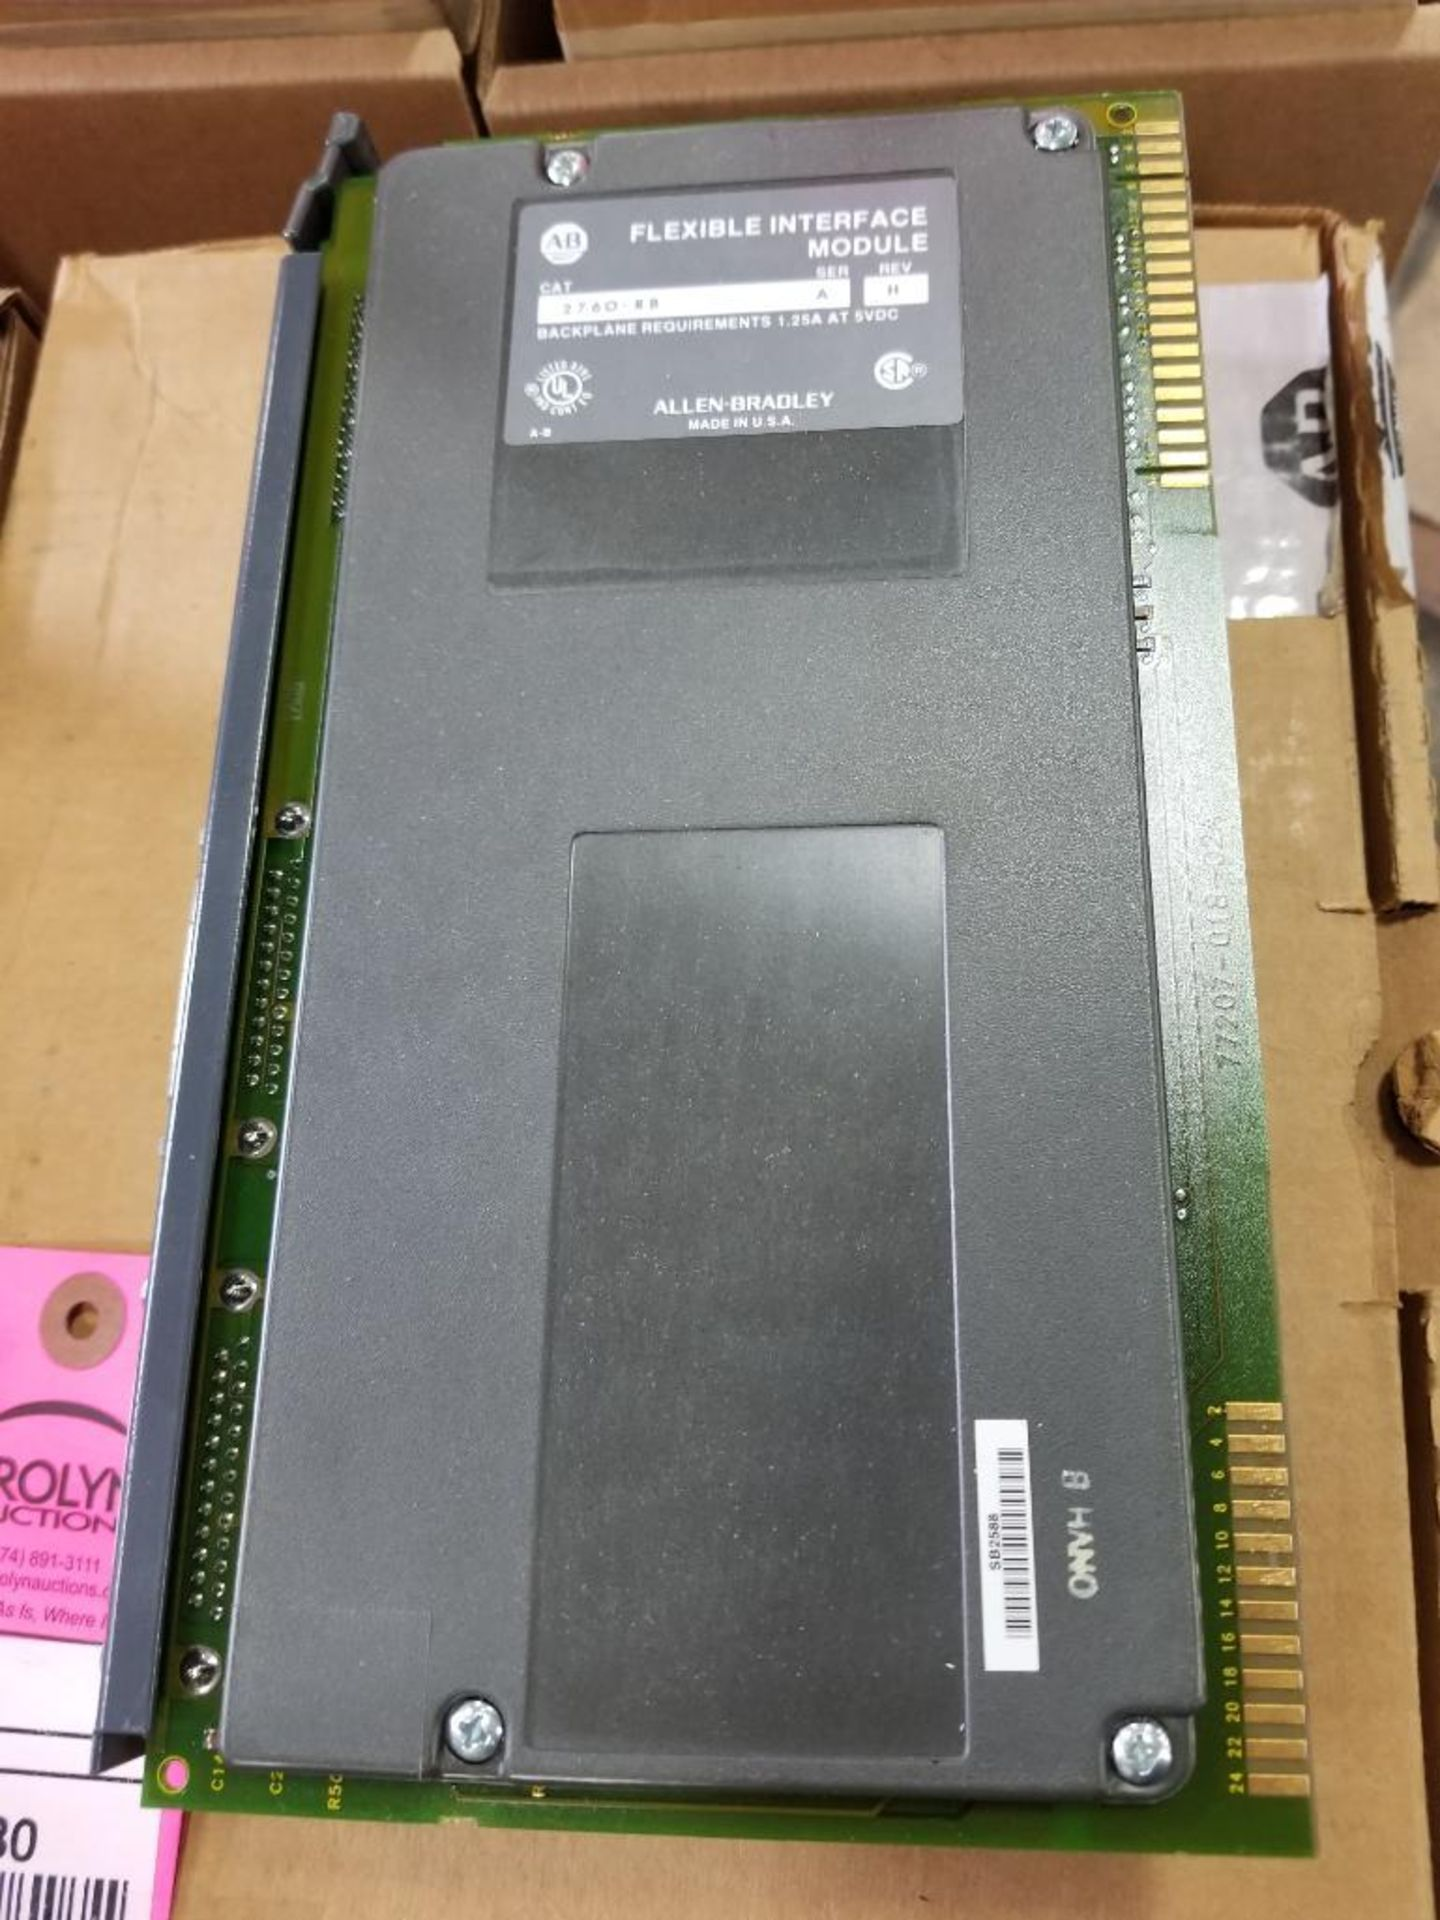 Allen Bradley flexible interface module. Catalog 2760-RB. New in box. - Image 2 of 5